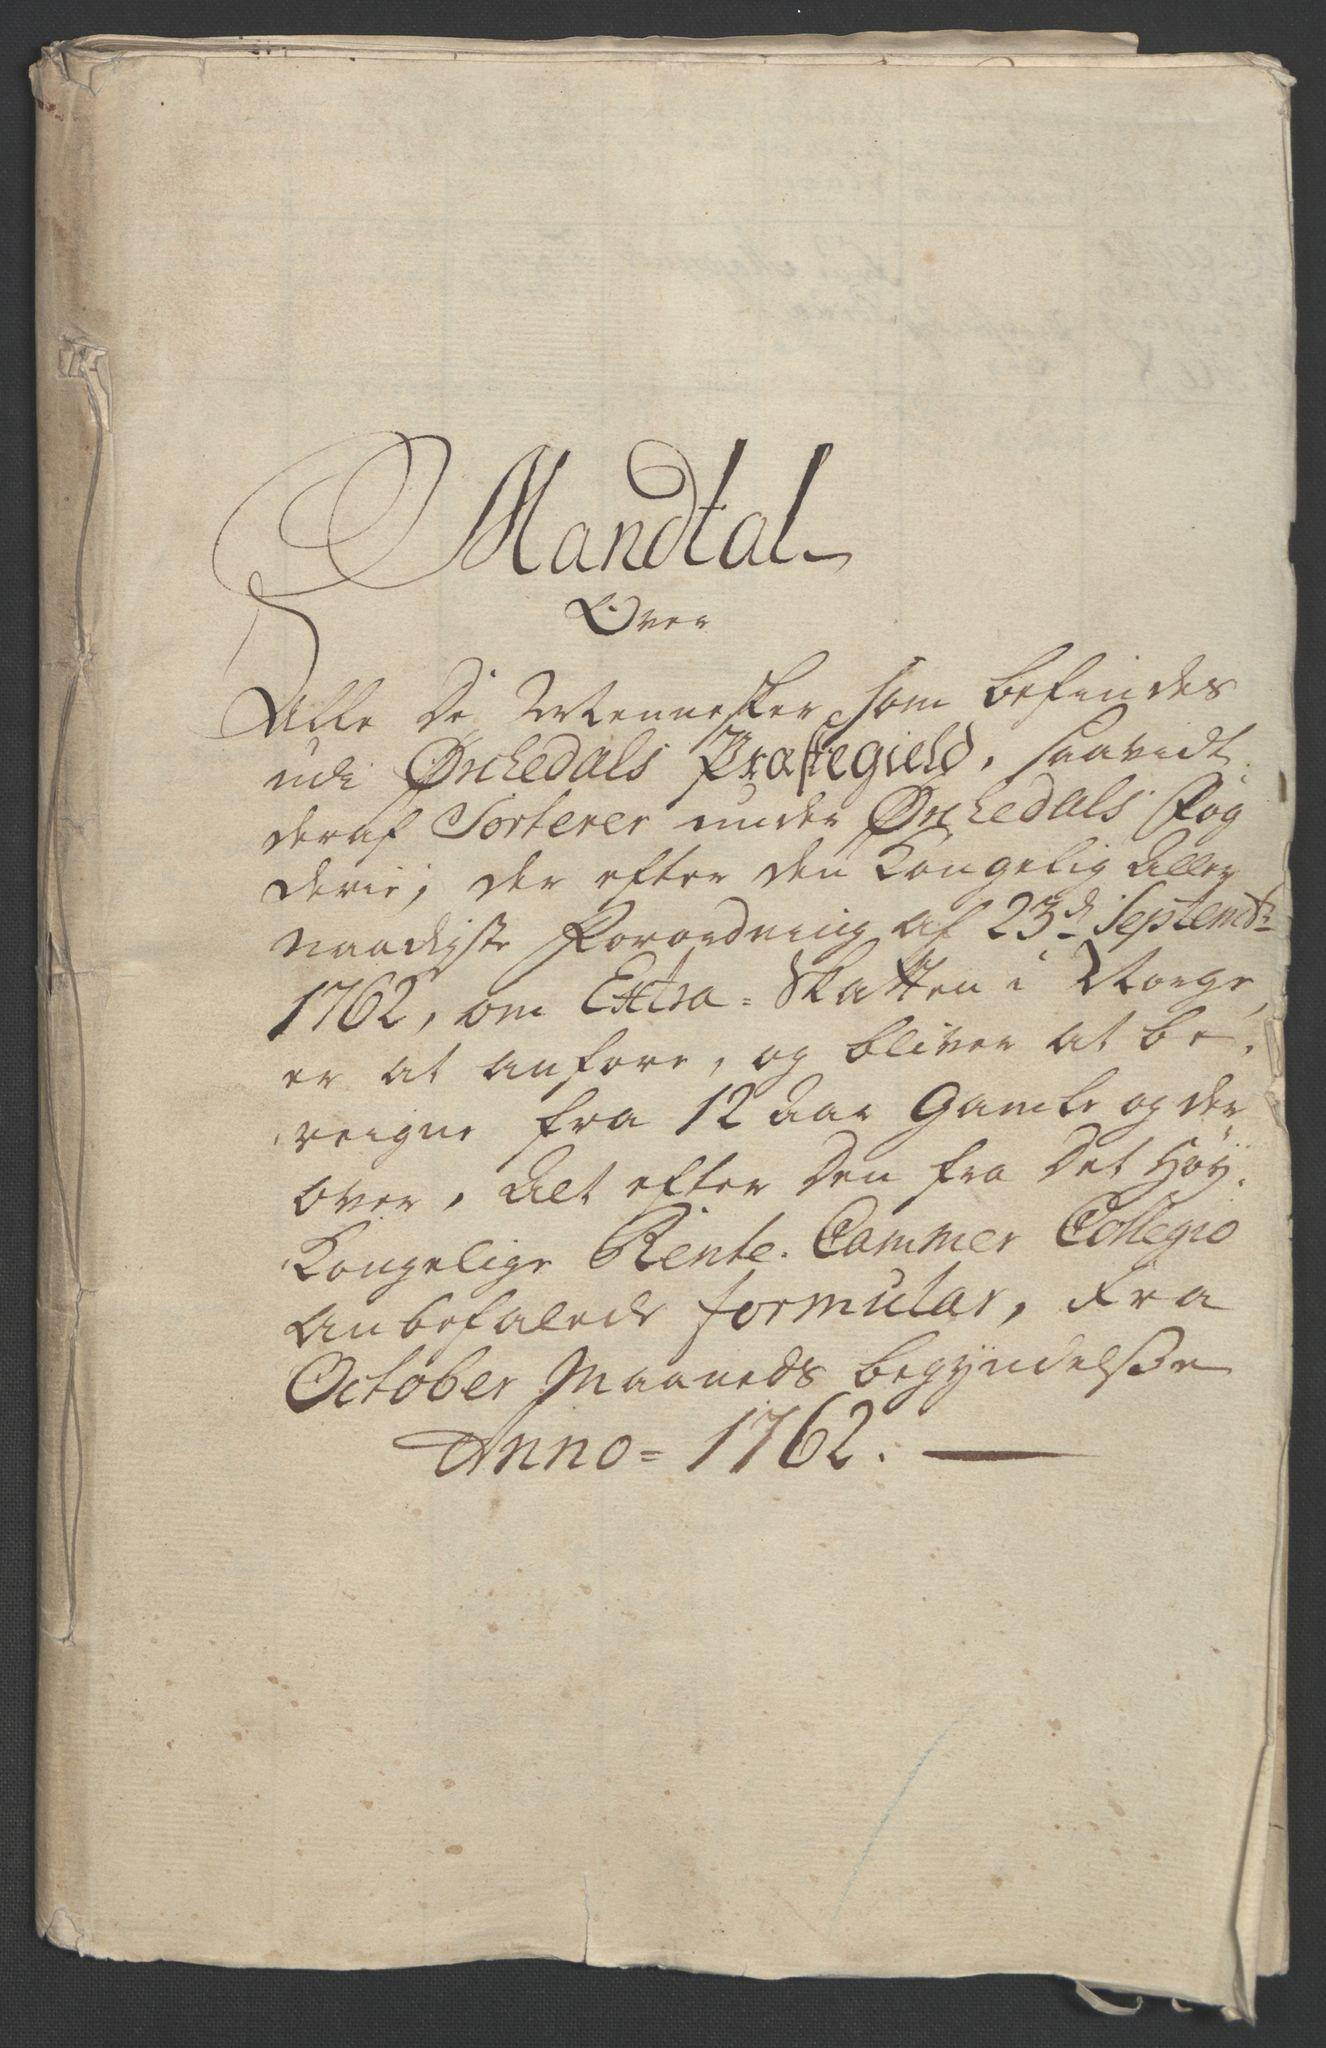 RA, Rentekammeret inntil 1814, Realistisk ordnet avdeling, Ol/L0021: [Gg 10]: Ekstraskatten, 23.09.1762. Orkdal og Gauldal, 1762-1767, s. 38